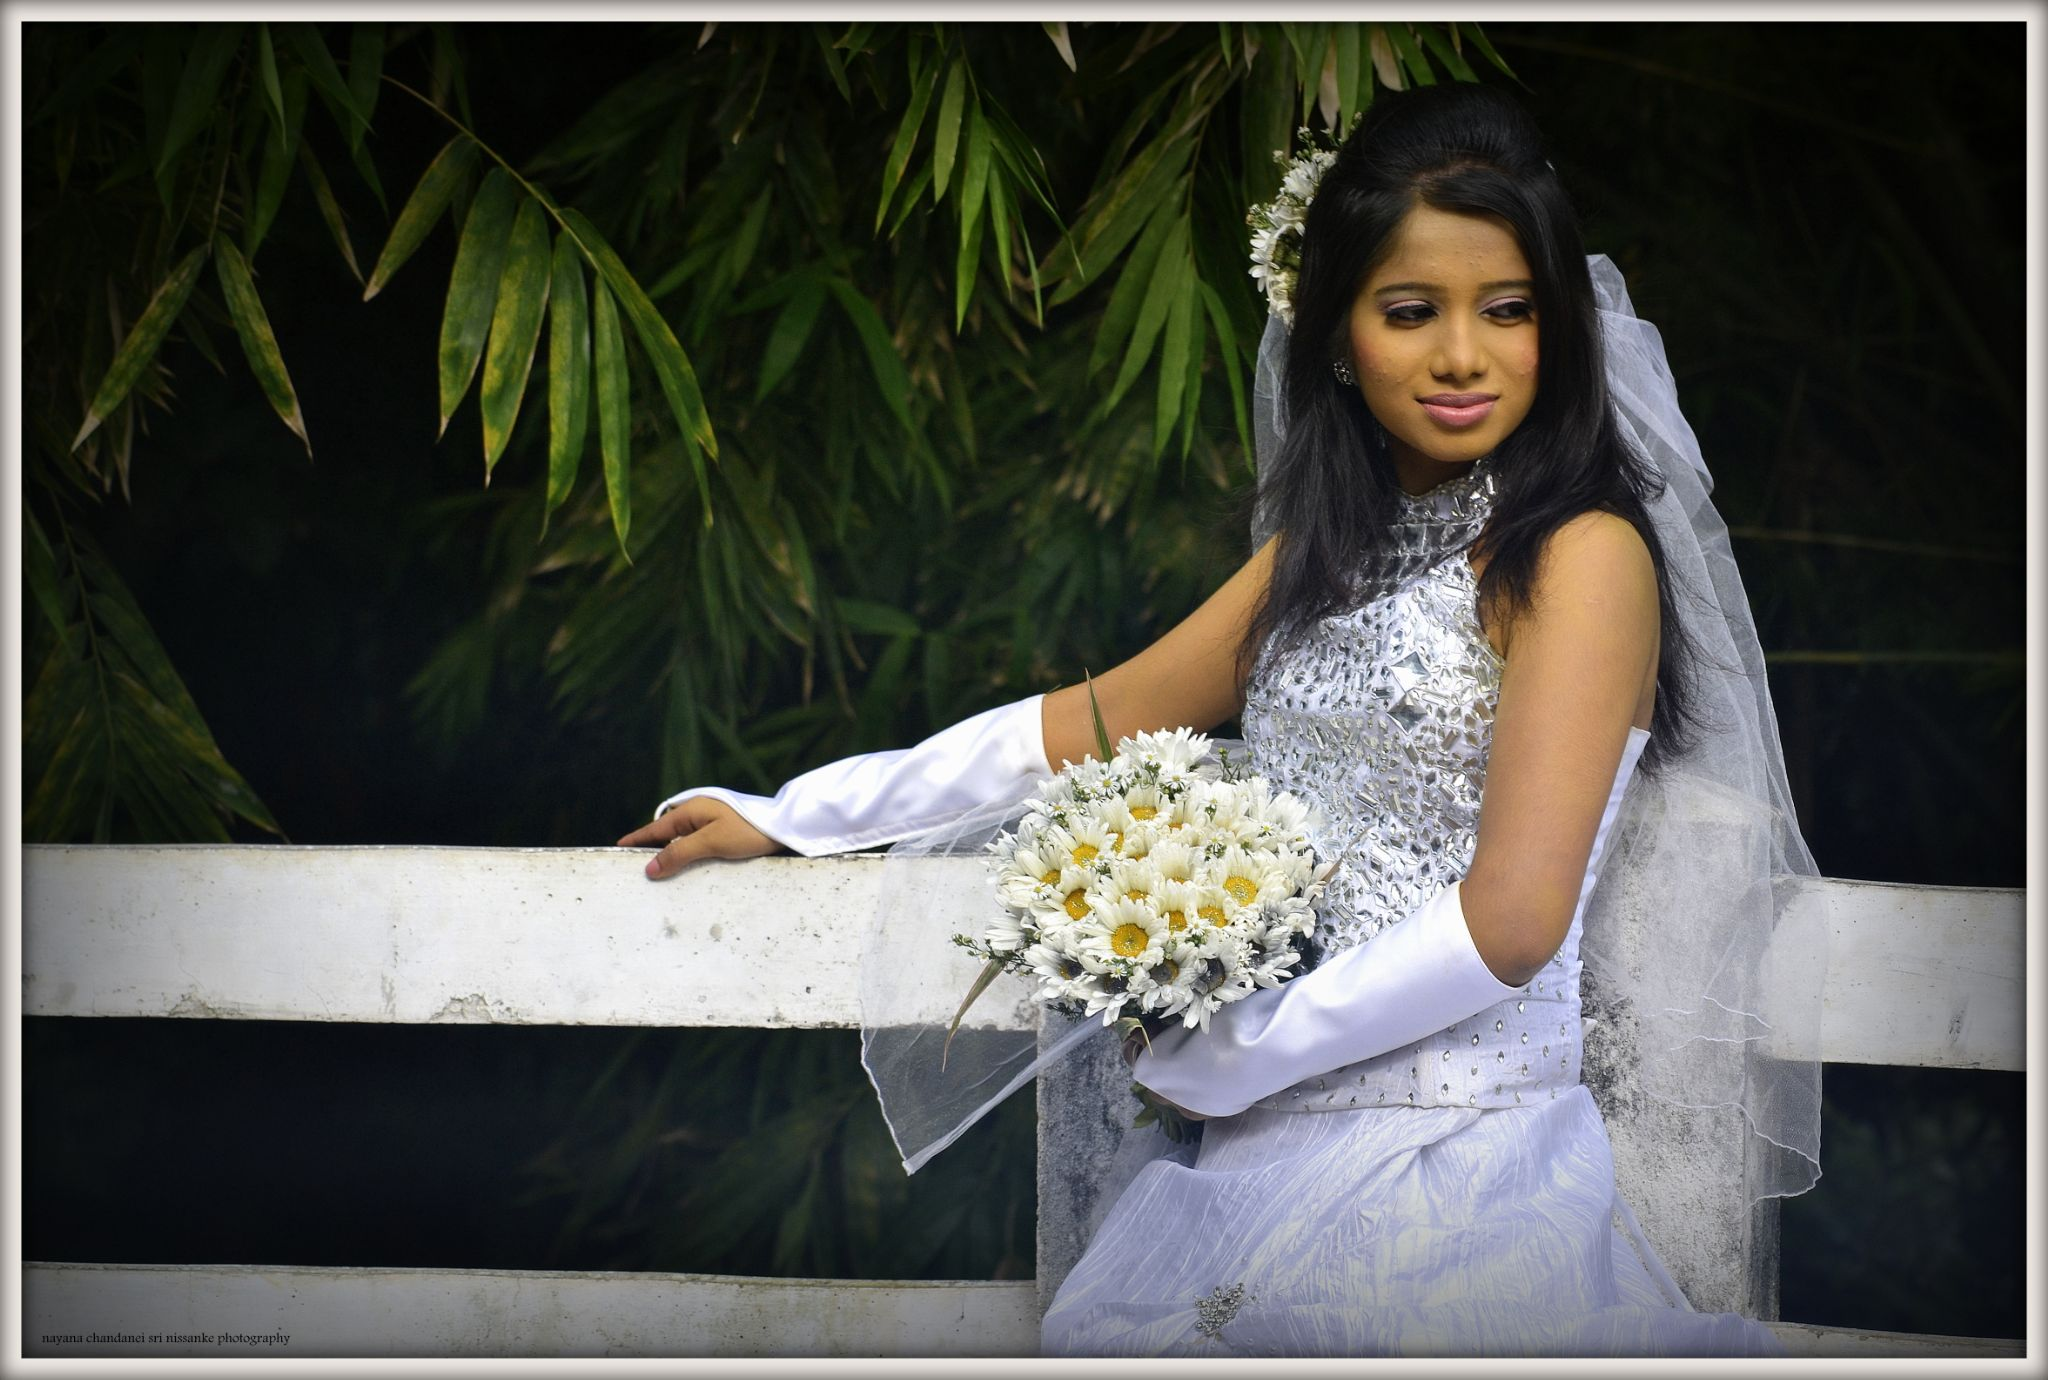 srilankan bride by nayanachandaneisrinissanke